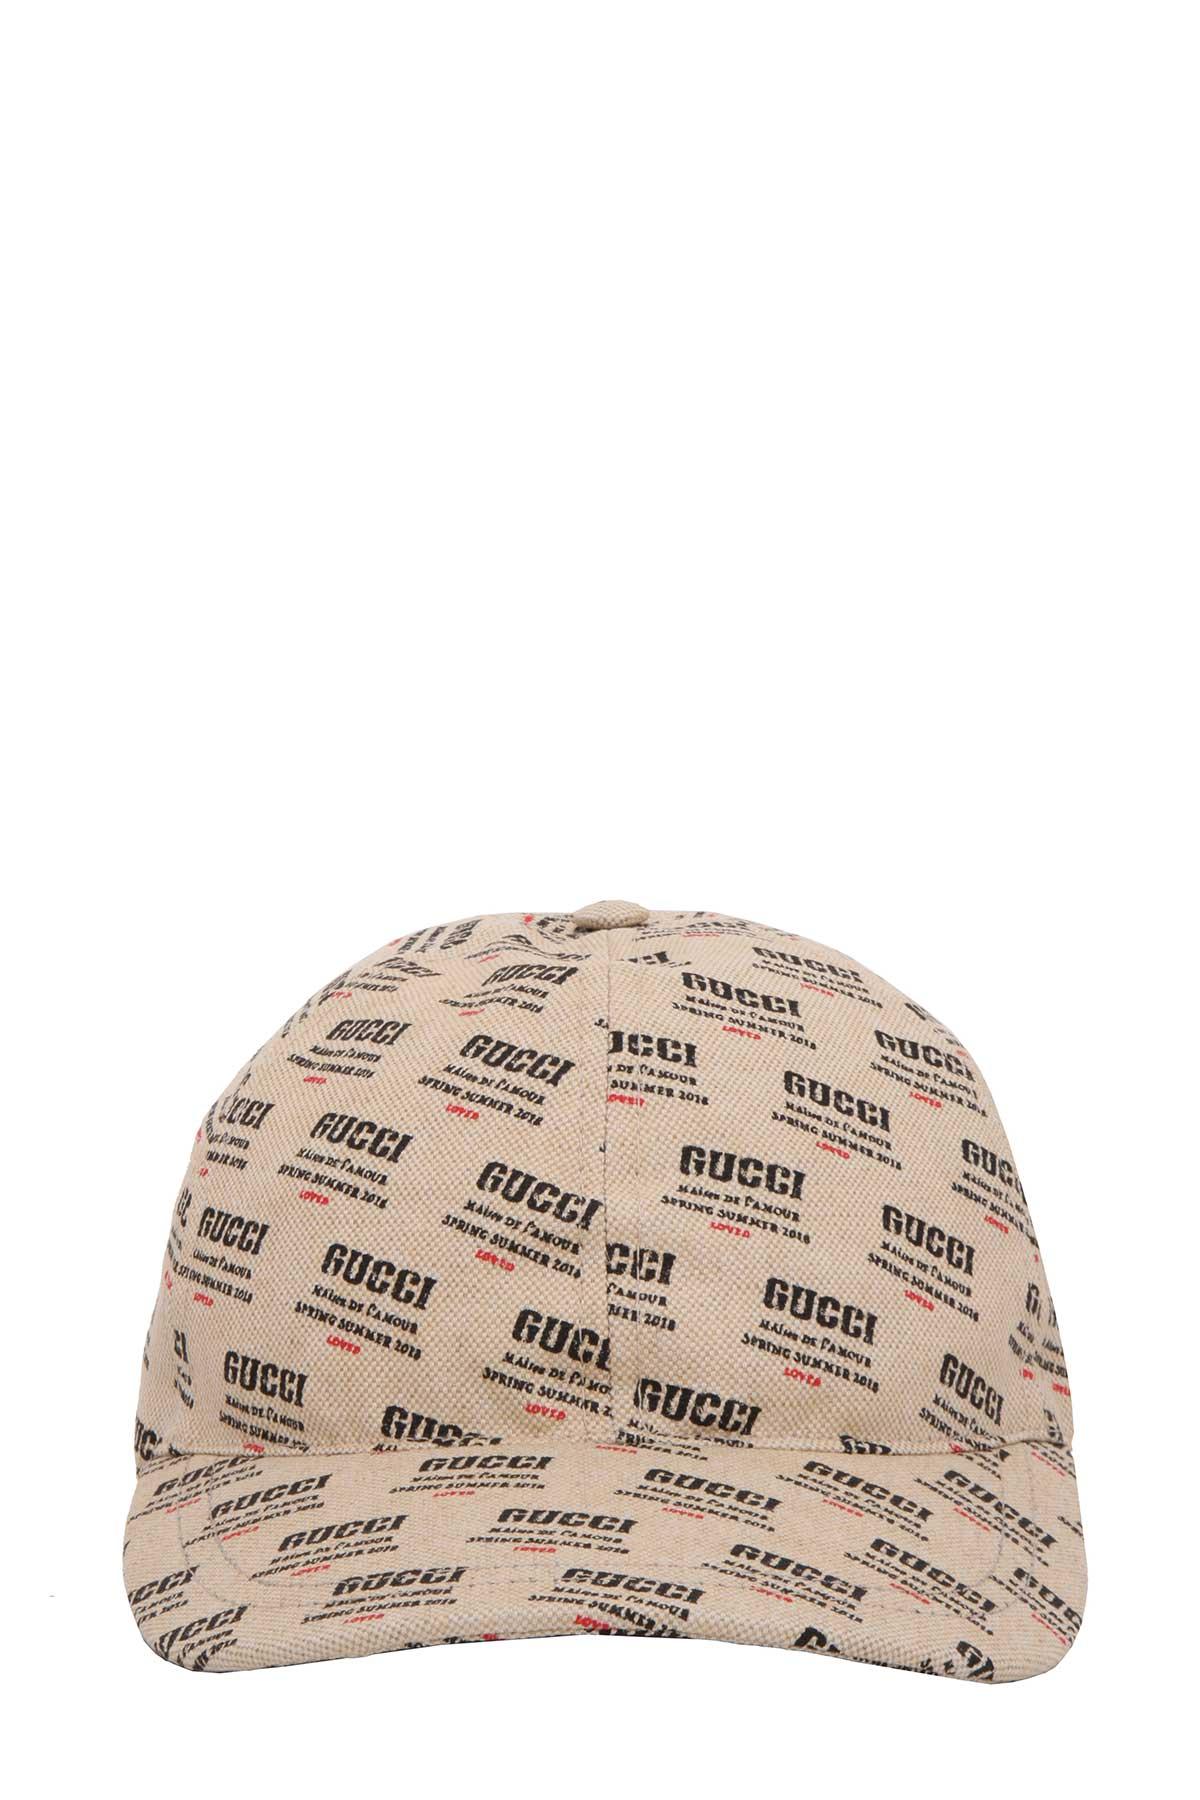 d37f0a17834 Gucci Logo-Print Linen And Cotton-Blend Canvas Baseball Cap In Neutrals